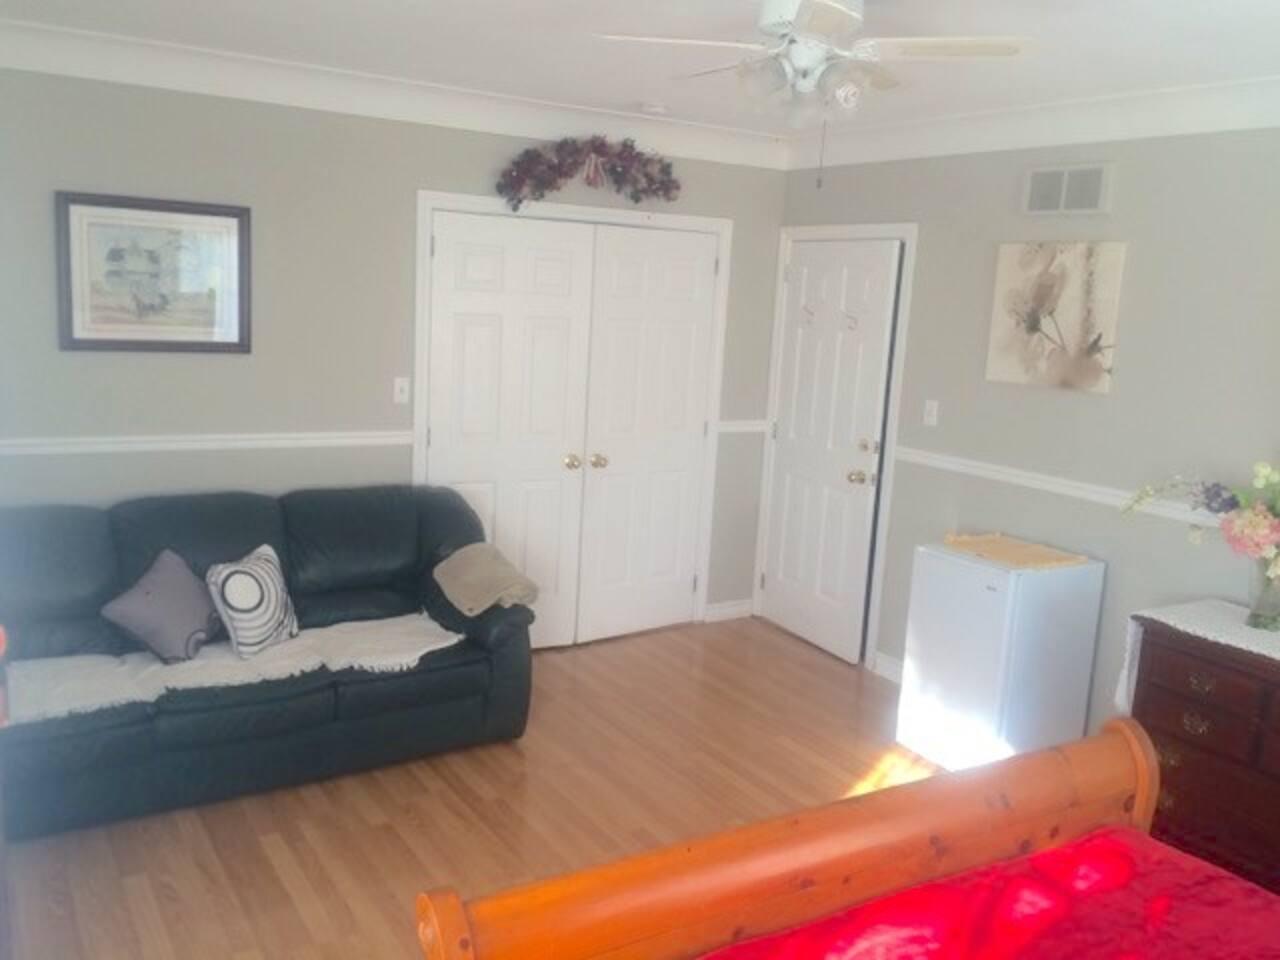 Couch, Mini Fridge, Closet, Drawer set, Hardwood floor